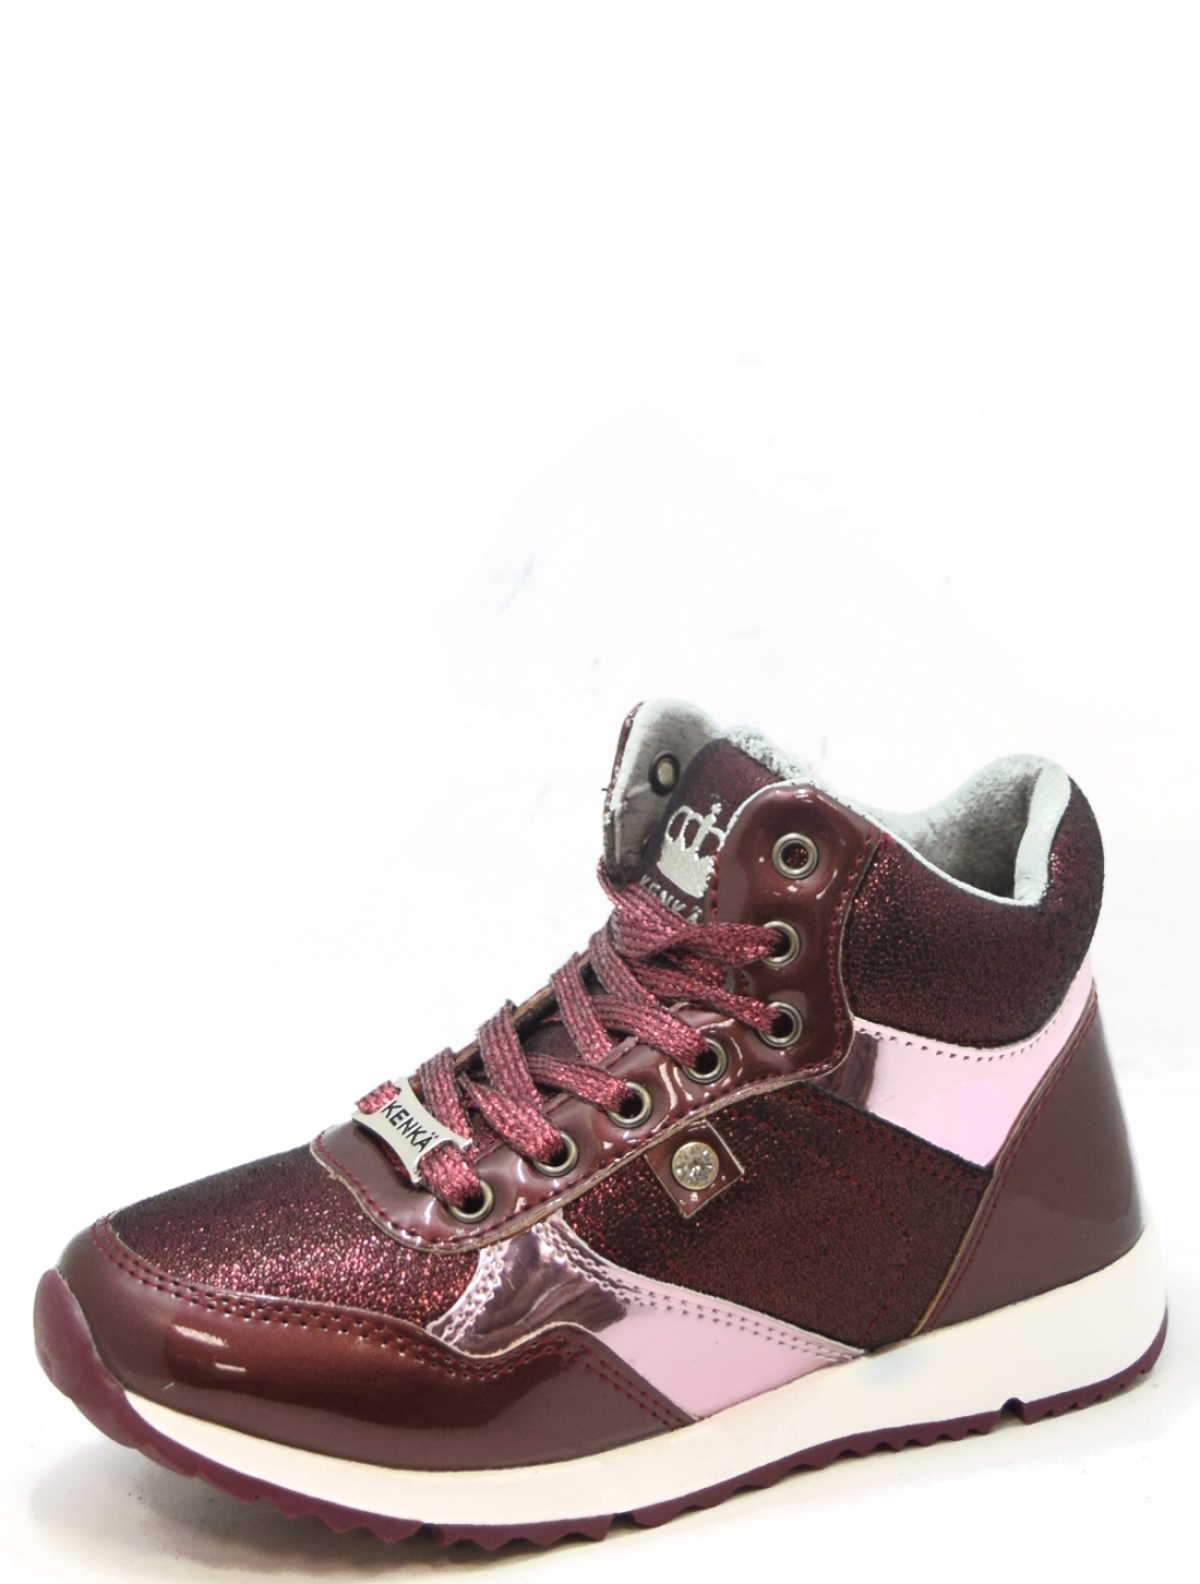 Kenka FKL-197-27-24 кроссовки для девочки